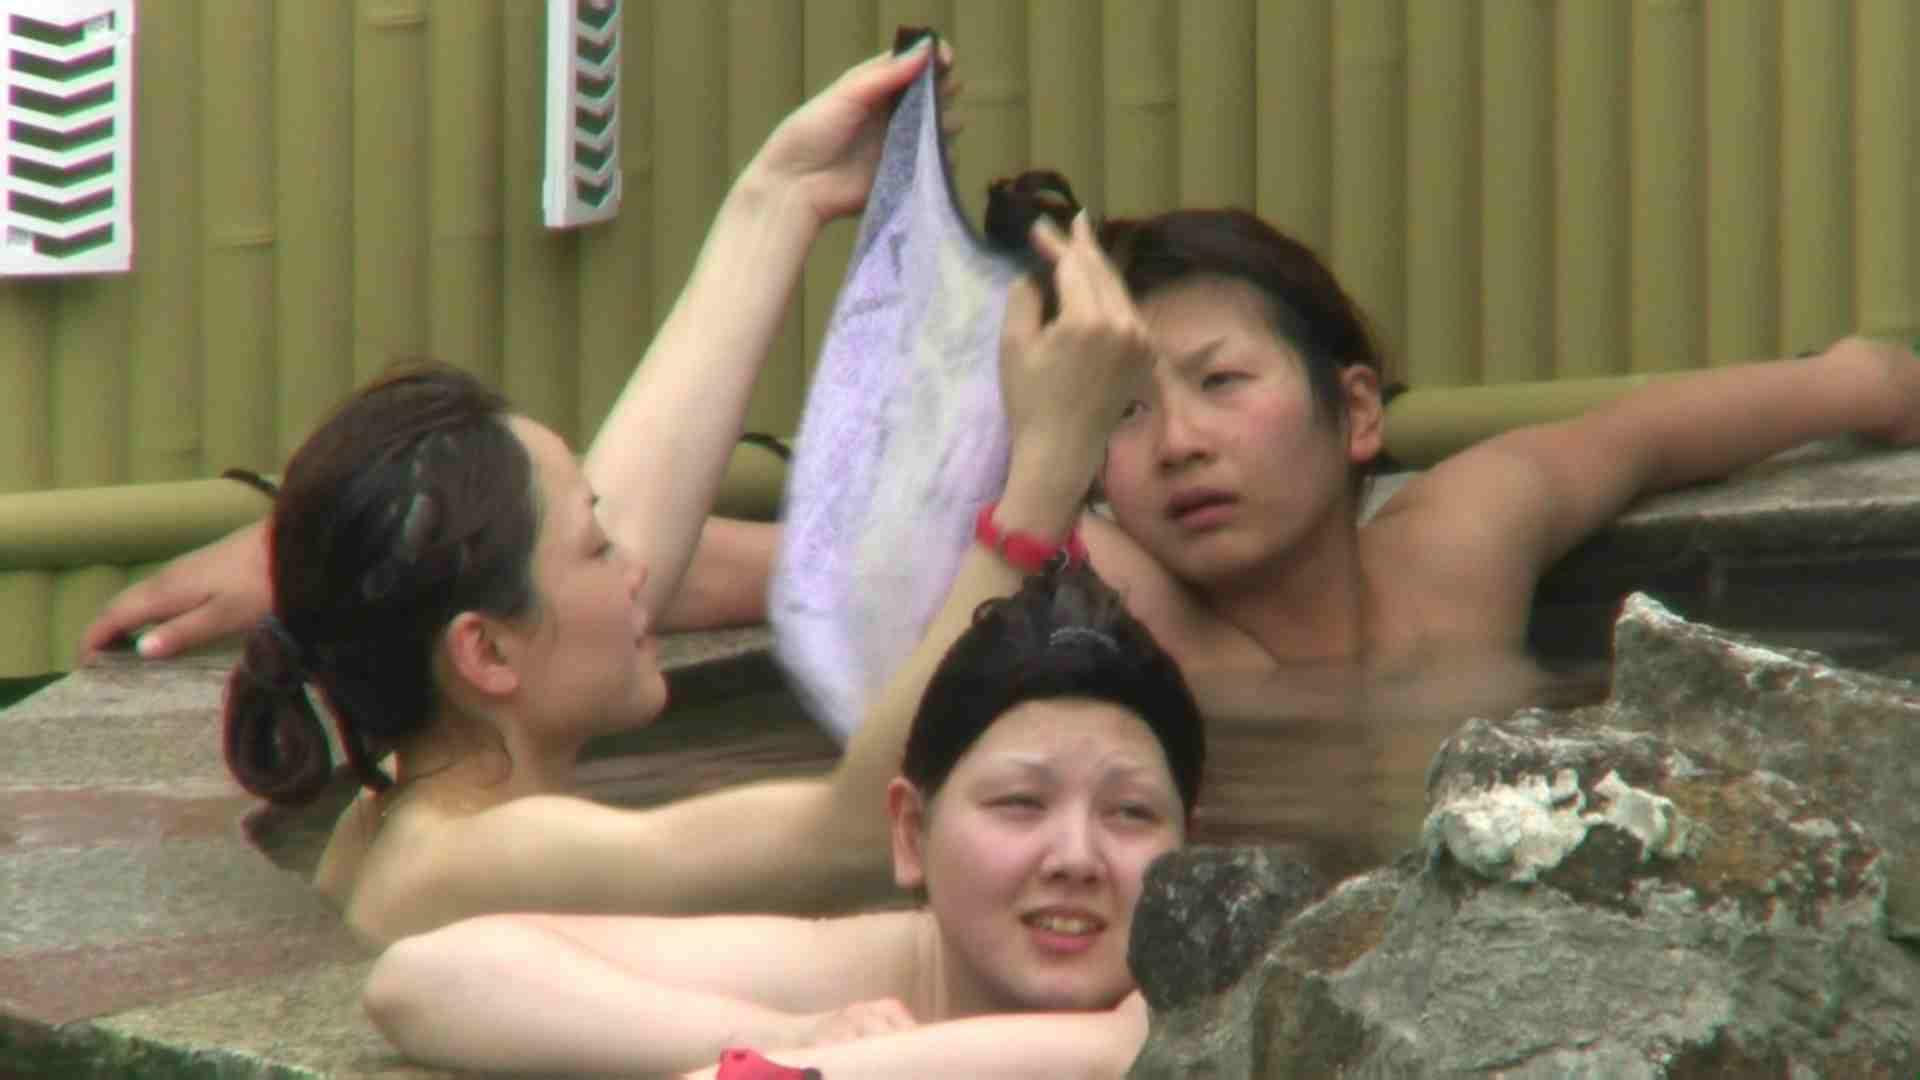 Aquaな露天風呂Vol.66【VIP限定】 OLエロ画像 覗きオメコ動画キャプチャ 74PICs 20